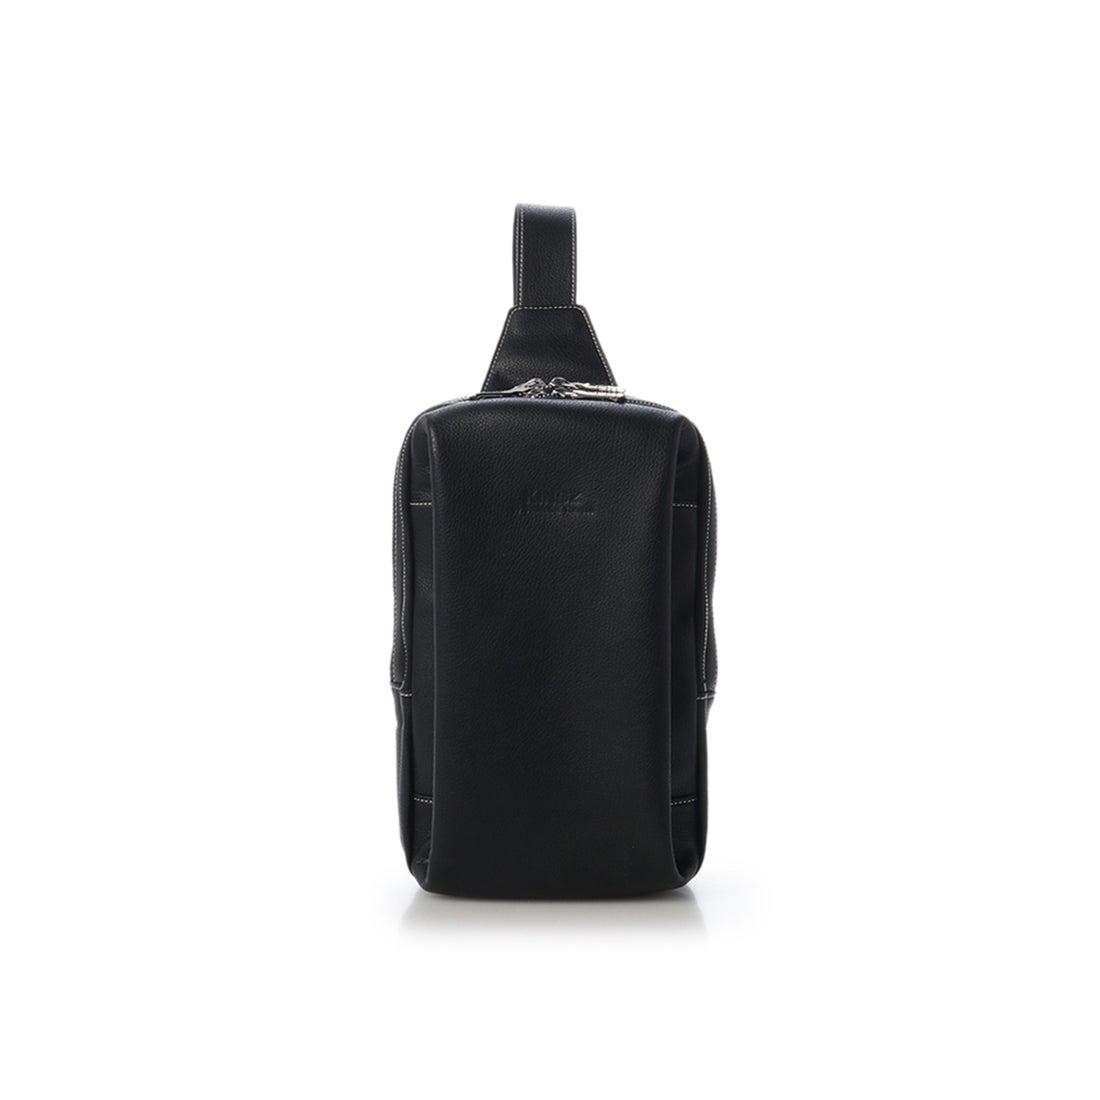 6c2f20739f84 キングズ バイ サマンサタバサ ボディバッグ ブラック. ¥22,680. ロコンド 靴とファッションの通販サイト